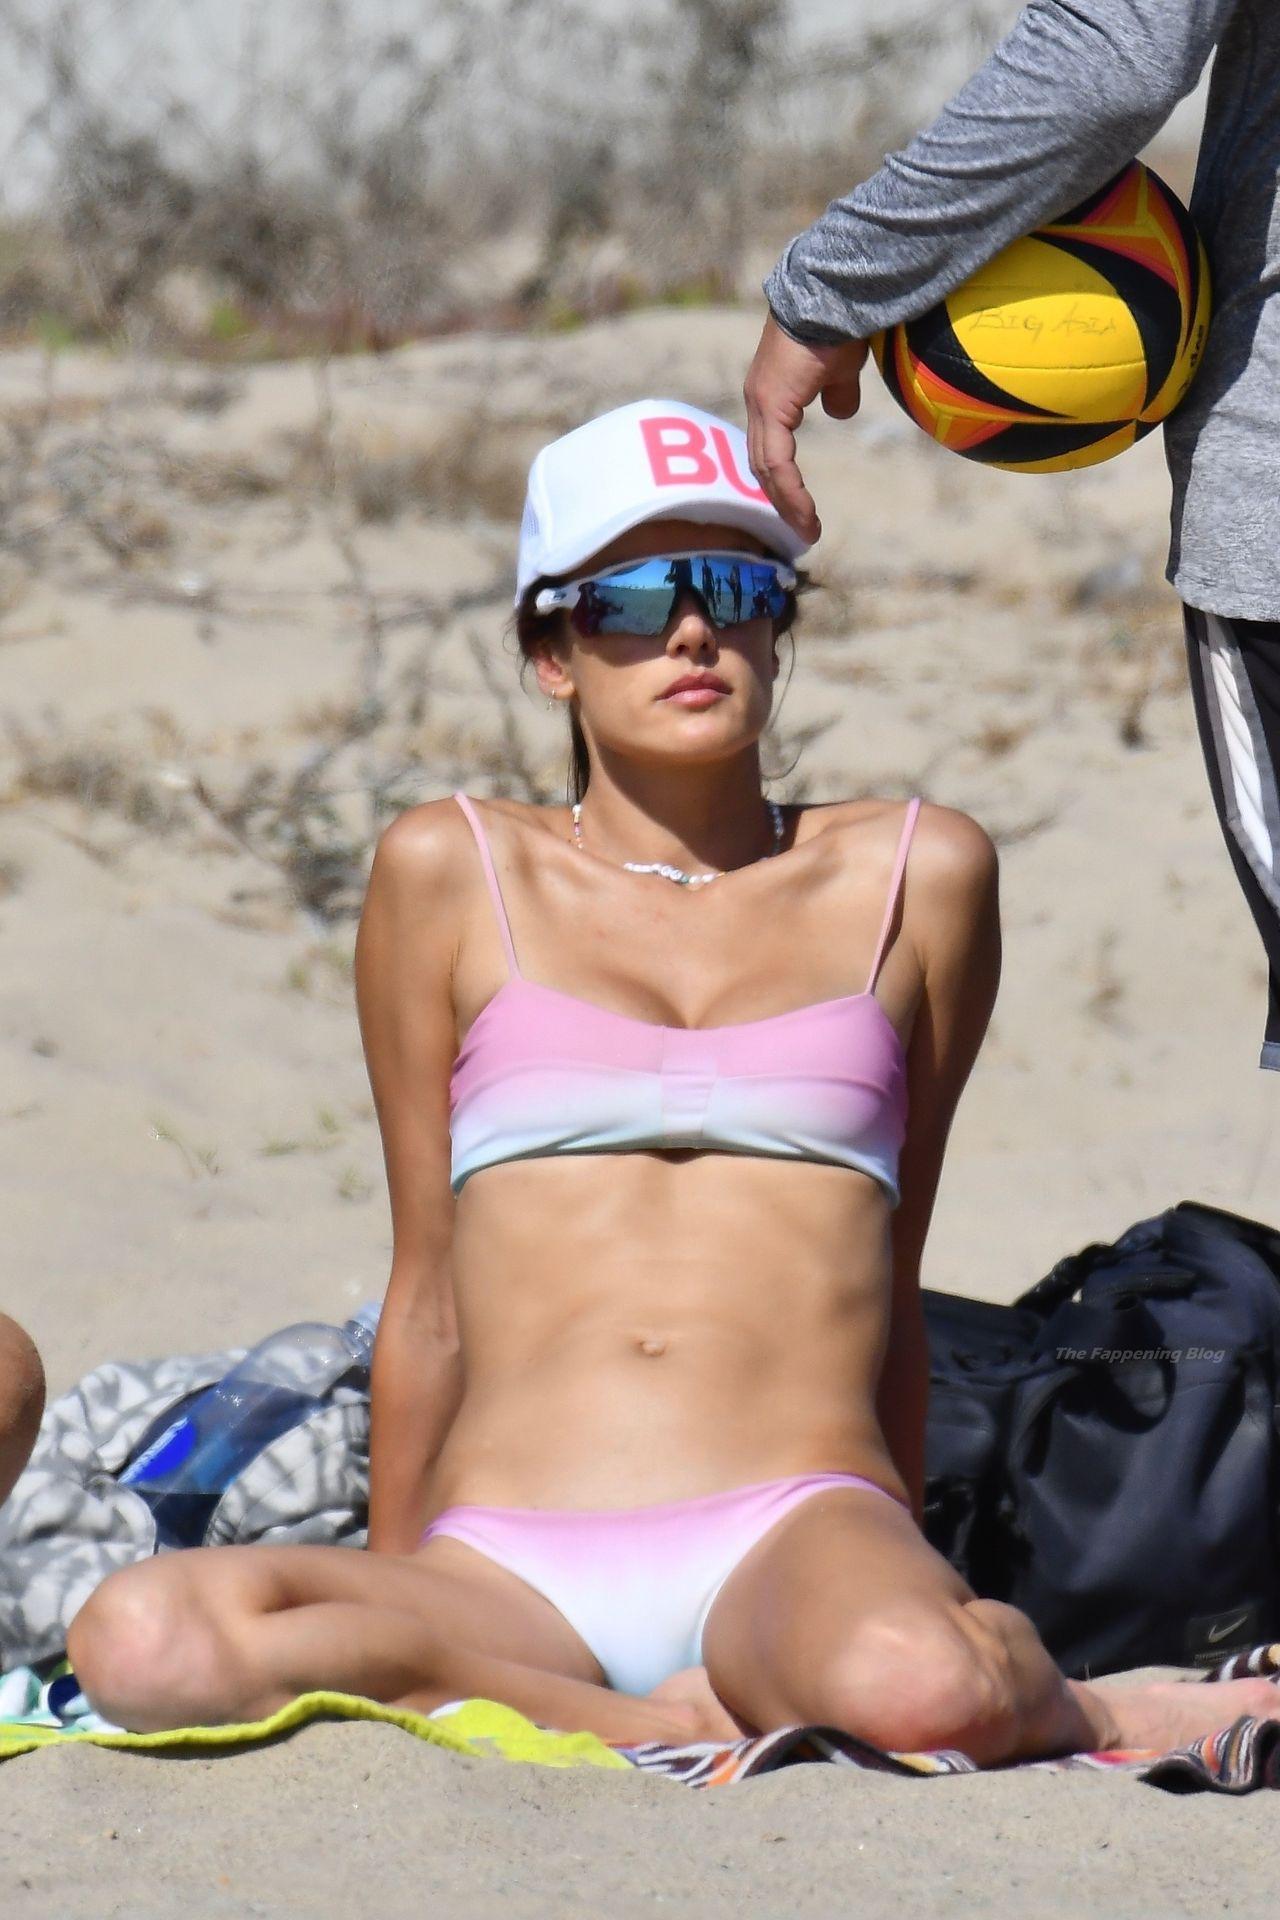 Alessandra-Ambrosio-Sexy-The-Fappening-Blog-90.jpg